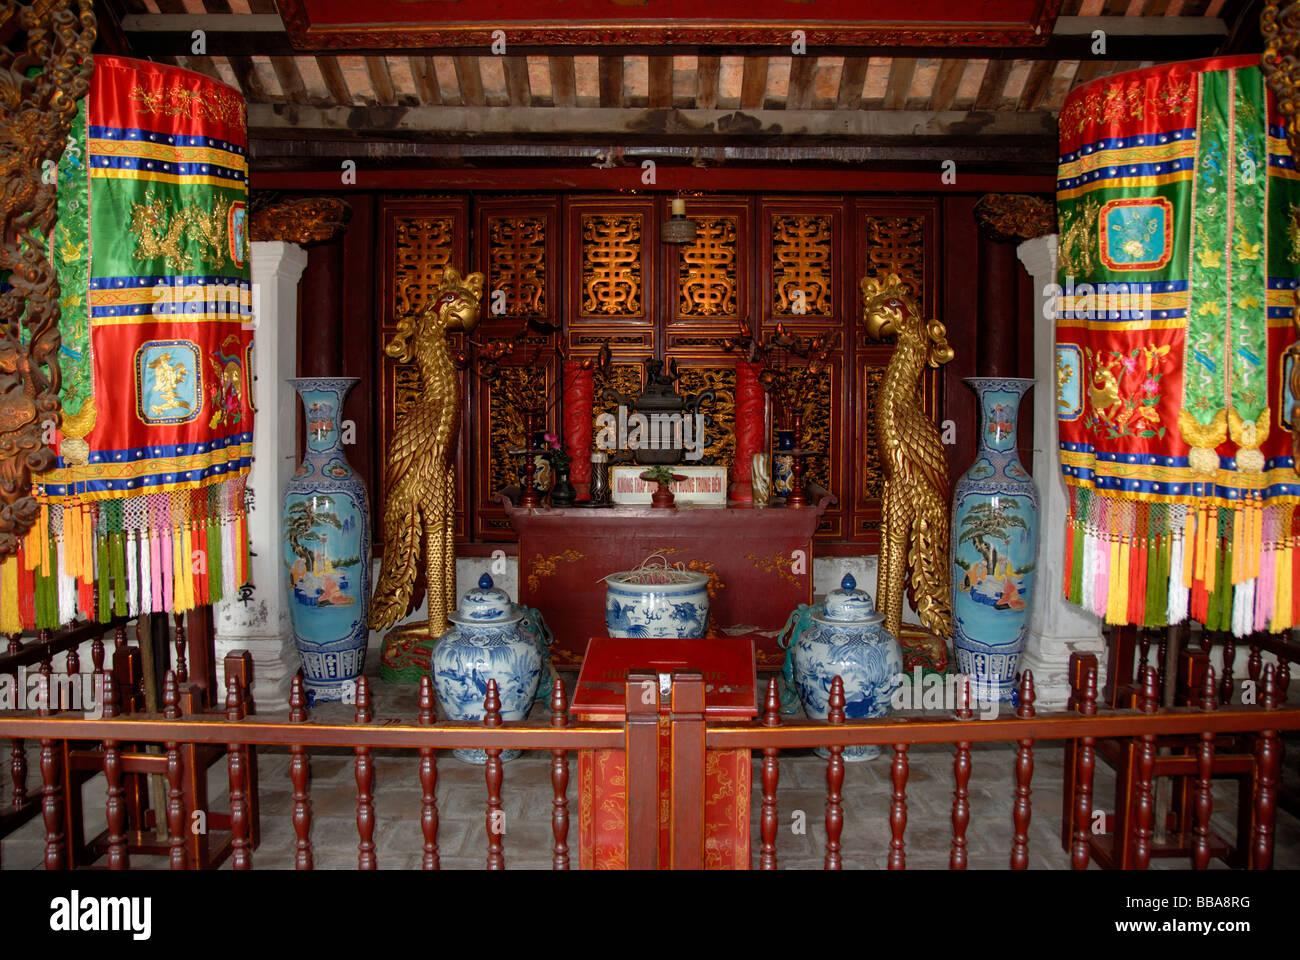 Buddhism, Phoenix, vases, altar in the Ngoc Son Temple, Hanoi, Vietnam, Southeast Asia, Asia - Stock Image